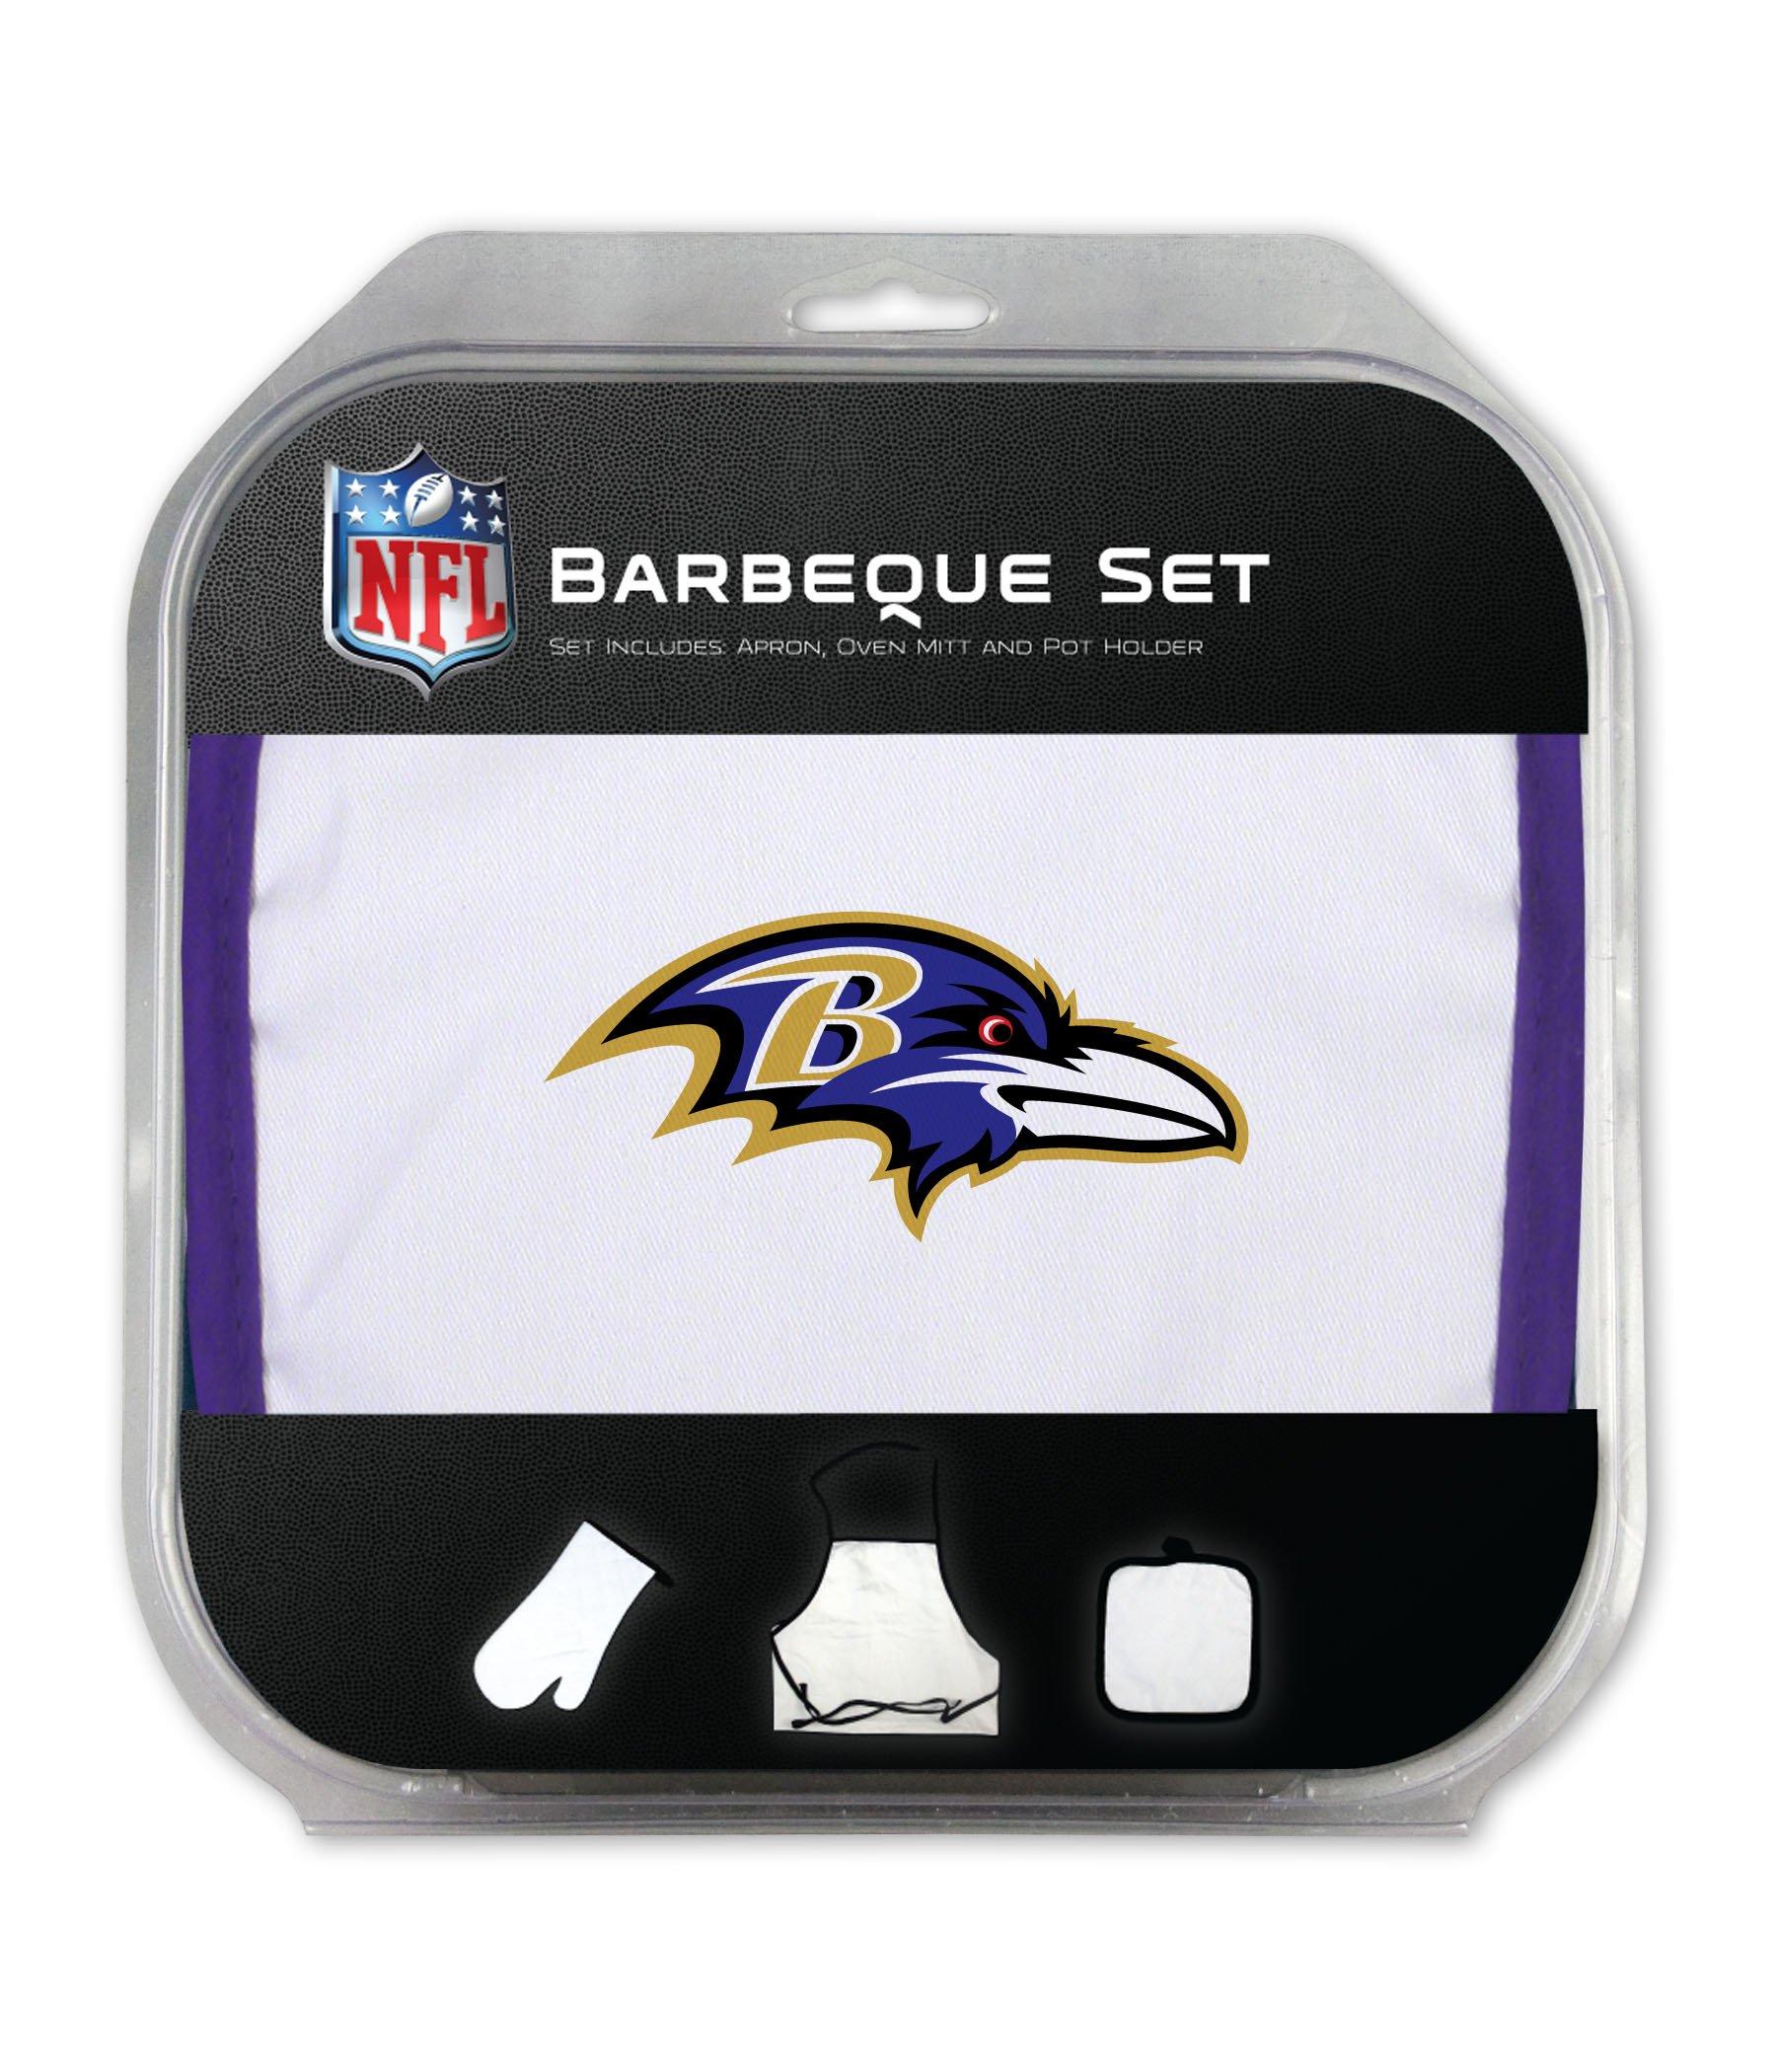 NFL Baltimore Ravens Tailgate Set